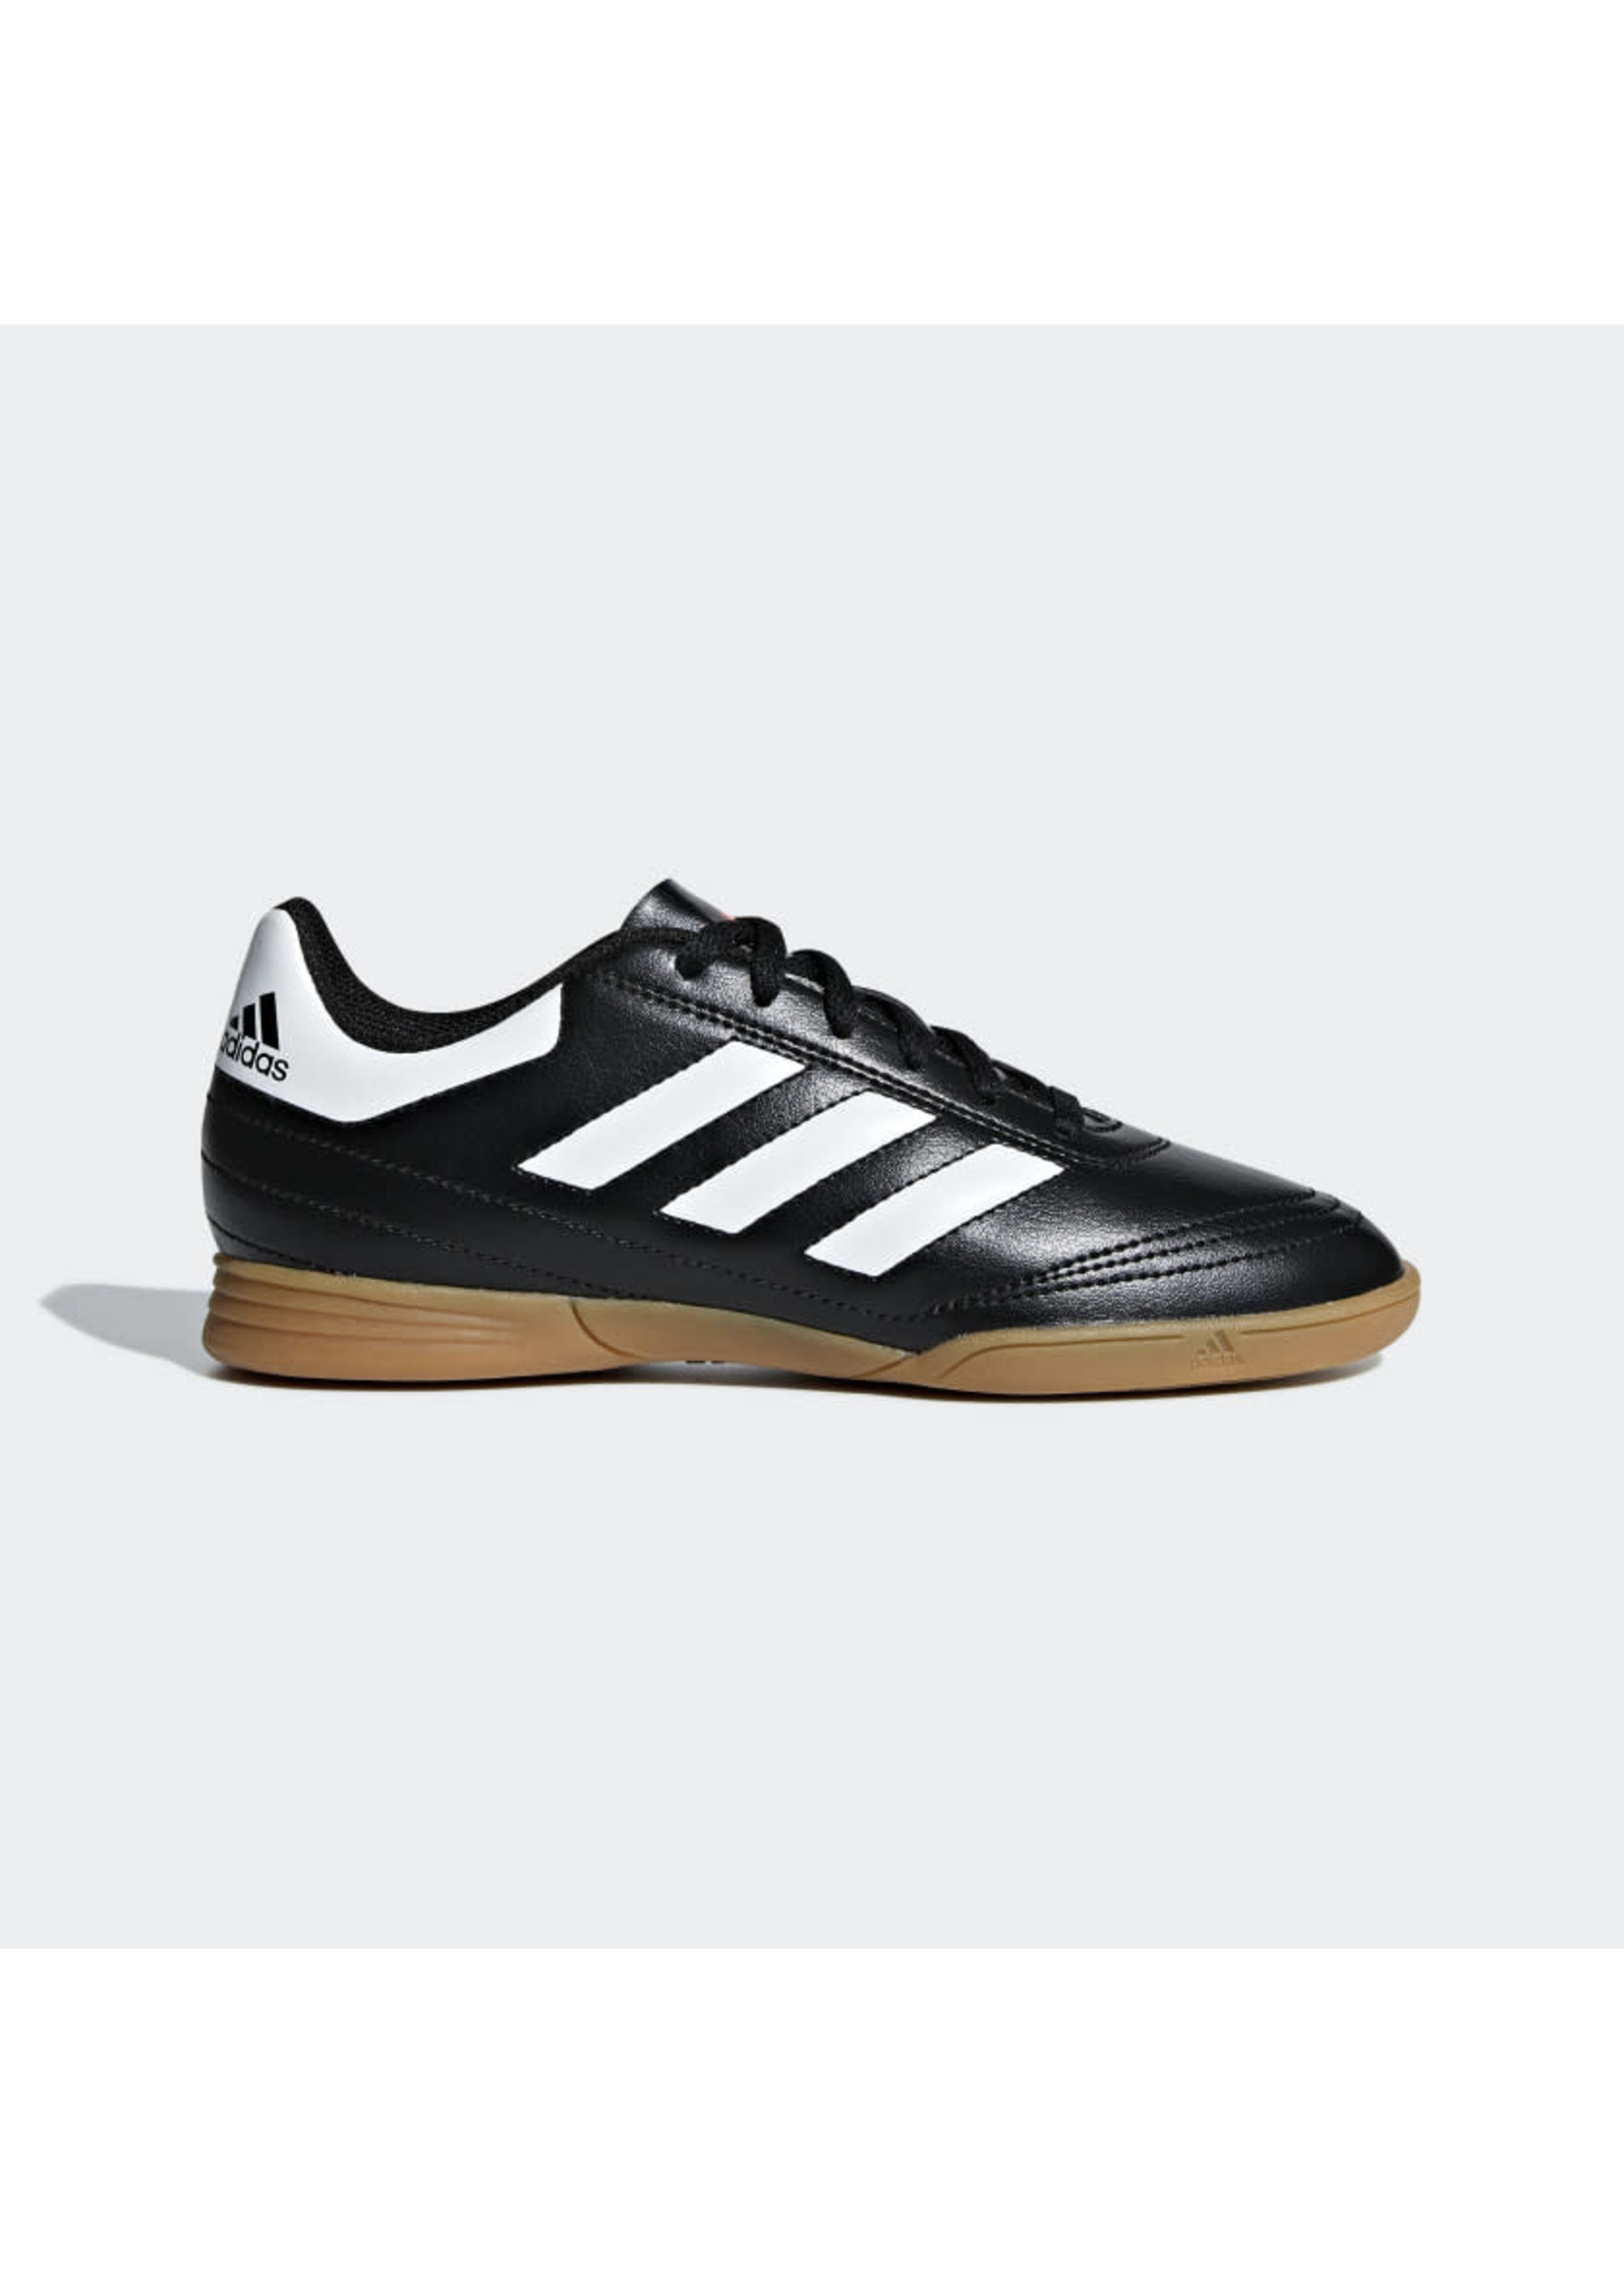 Adidas Goletto VI IN Jr AQ4293